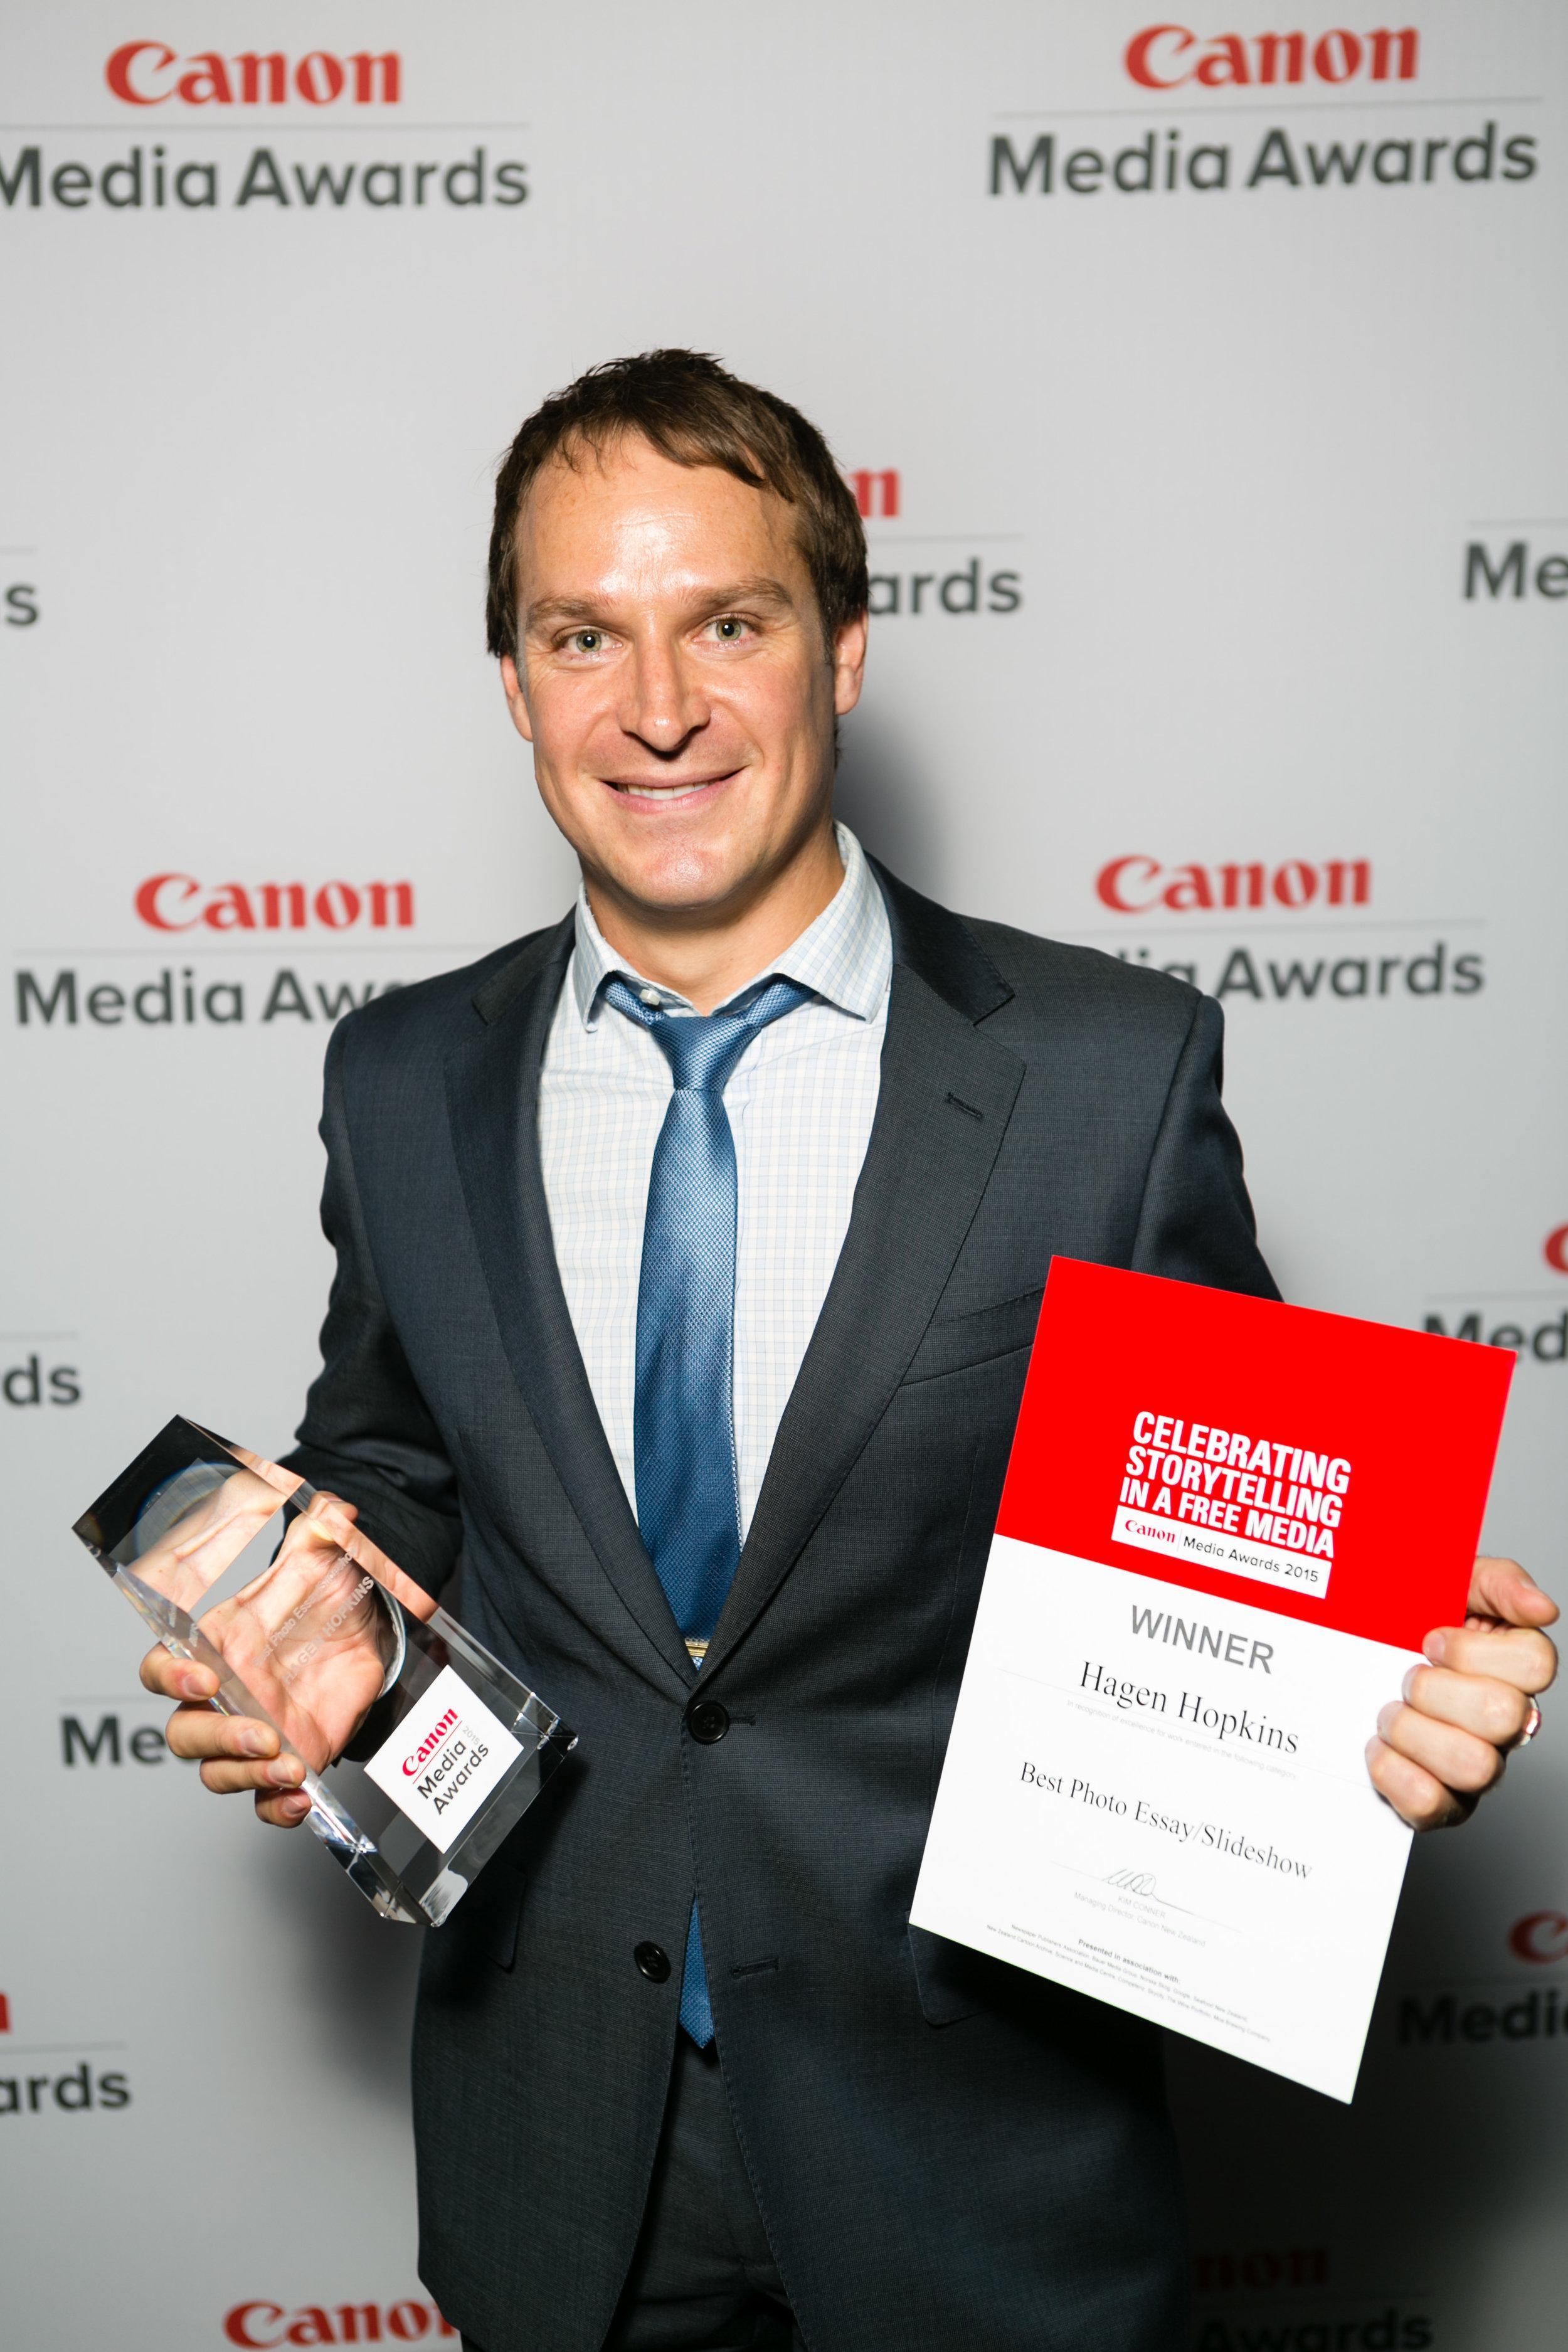 canon_media_awards_2015_interlike_nz_clinton_tudor-5989-212.jpg